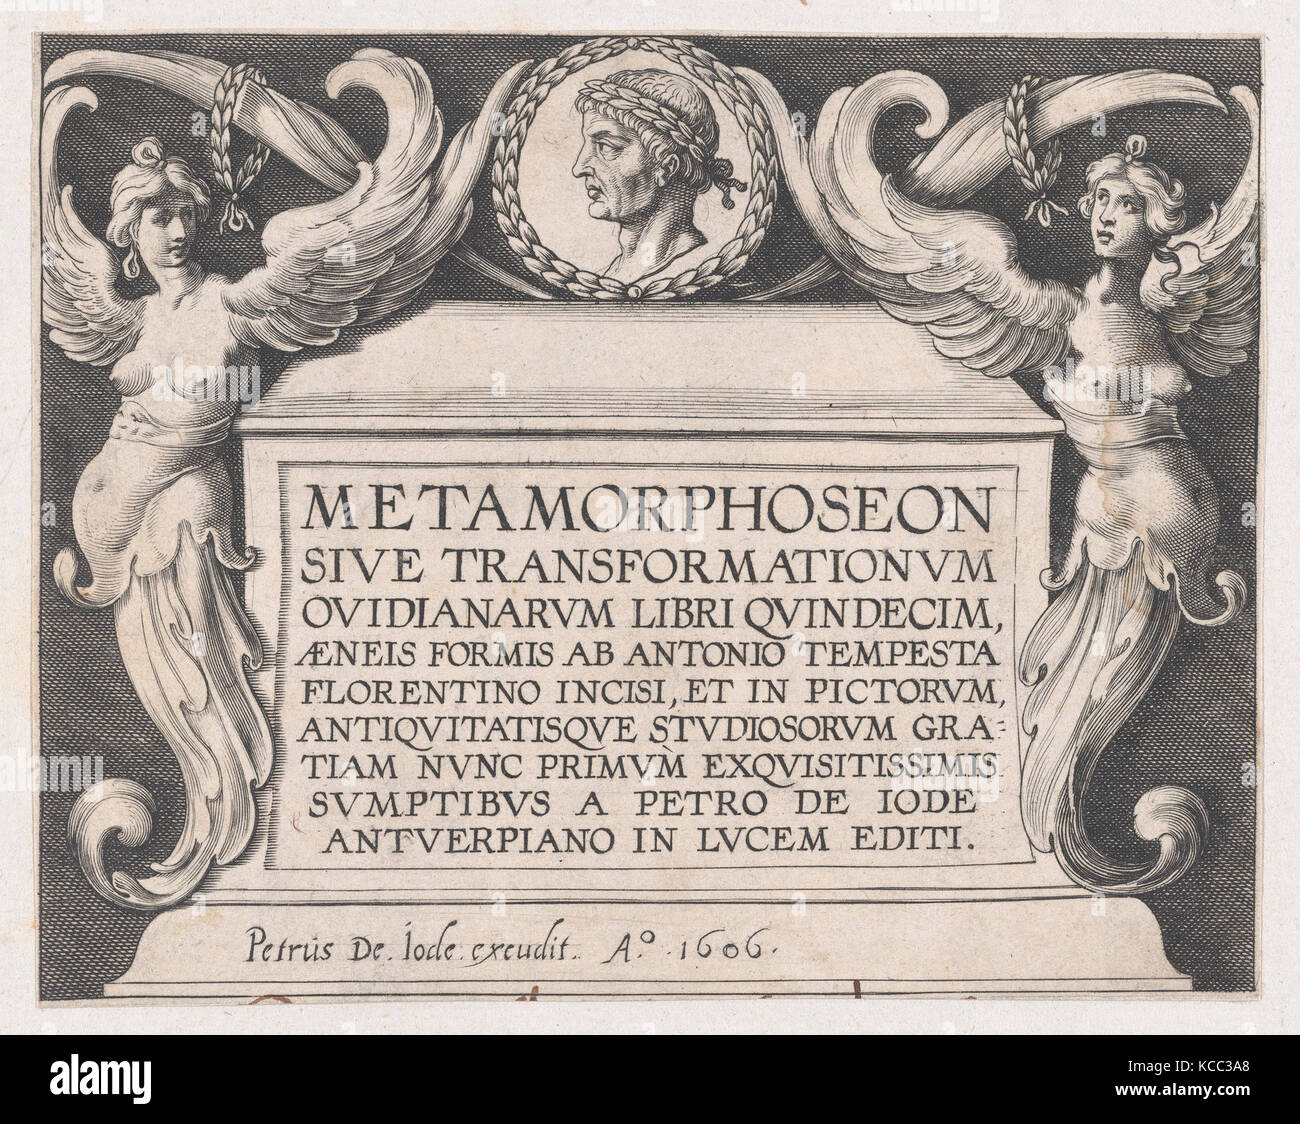 Titlepage to Ovid's 'Metamorphoses', Antonio Tempesta, 1606 - Stock Image